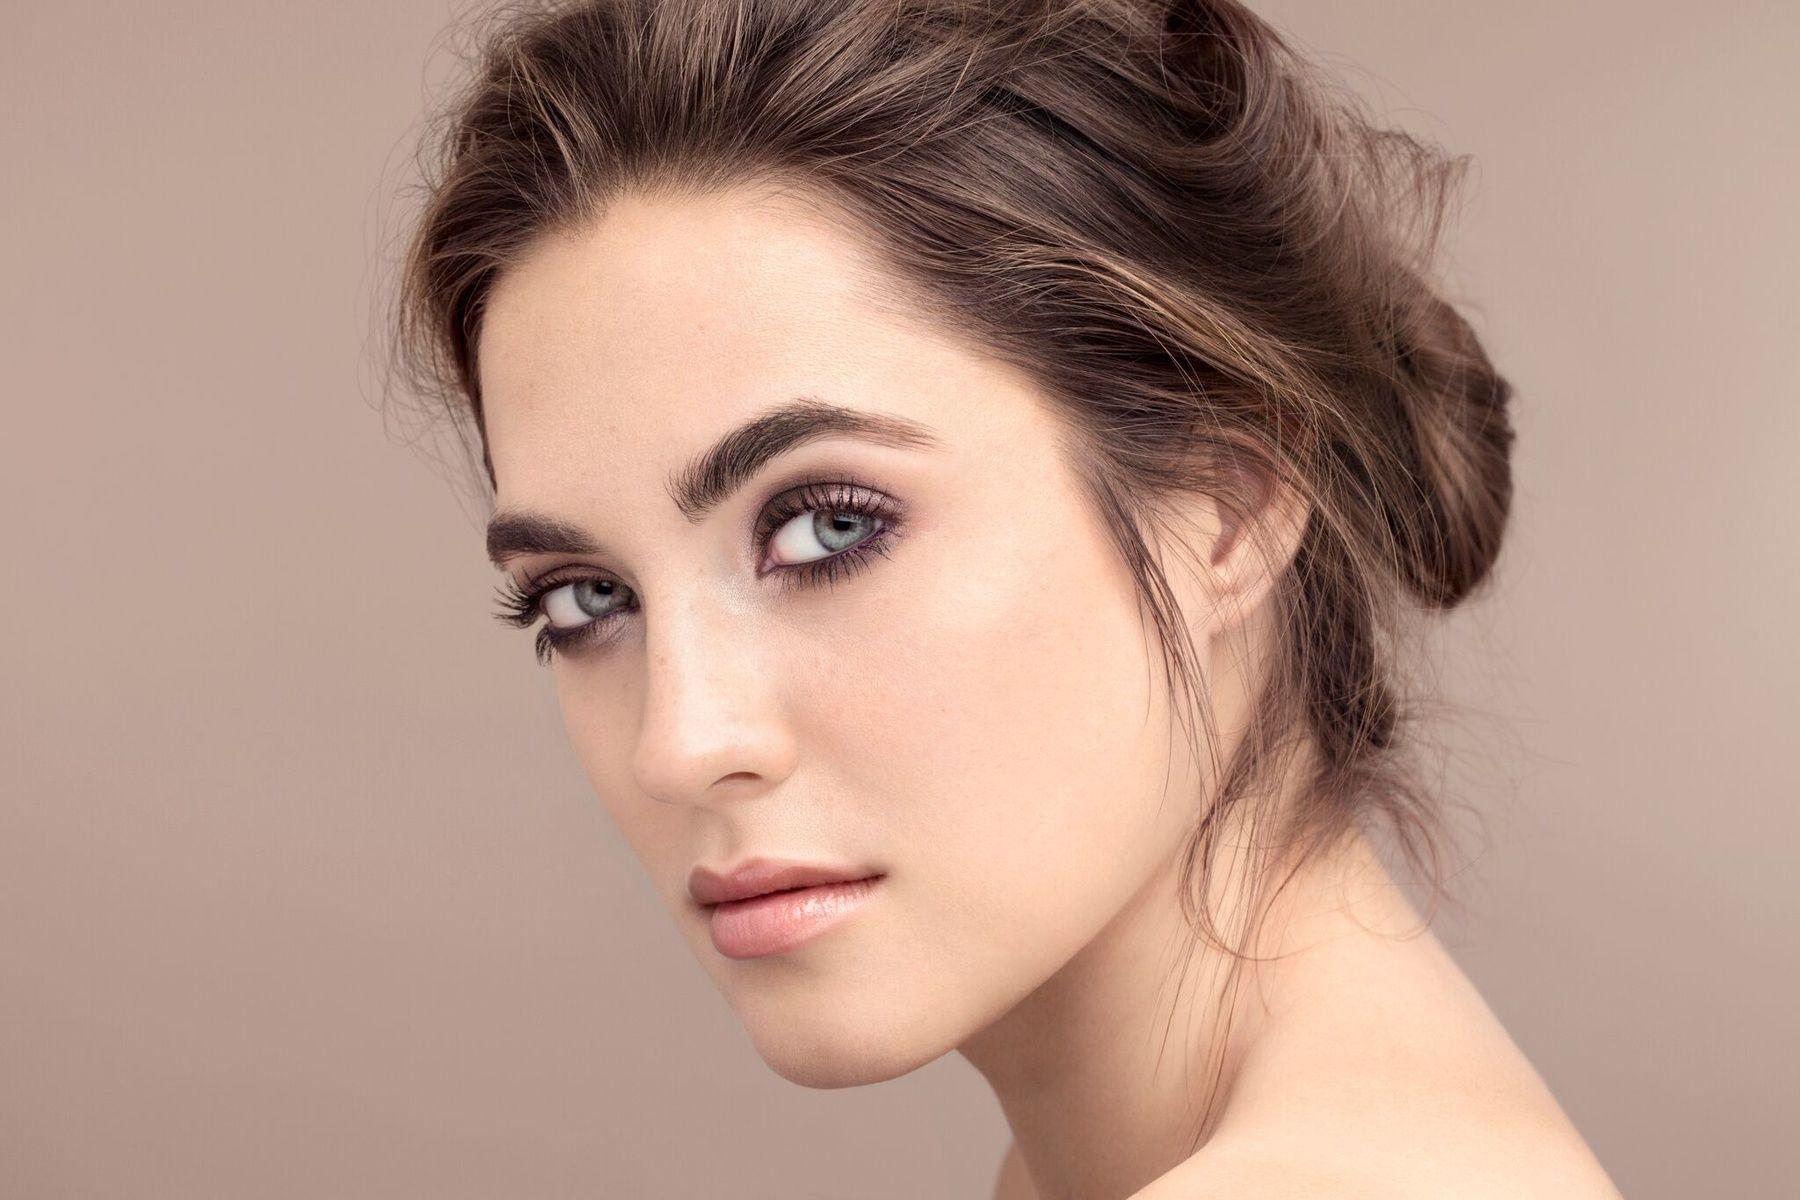 Makeup Portfolio - All Brides New York : The Best Makeup Artist in New York City/Top Makeup Artist in NYC/ Asian Wedding Makeup Artist New York Makeup ...